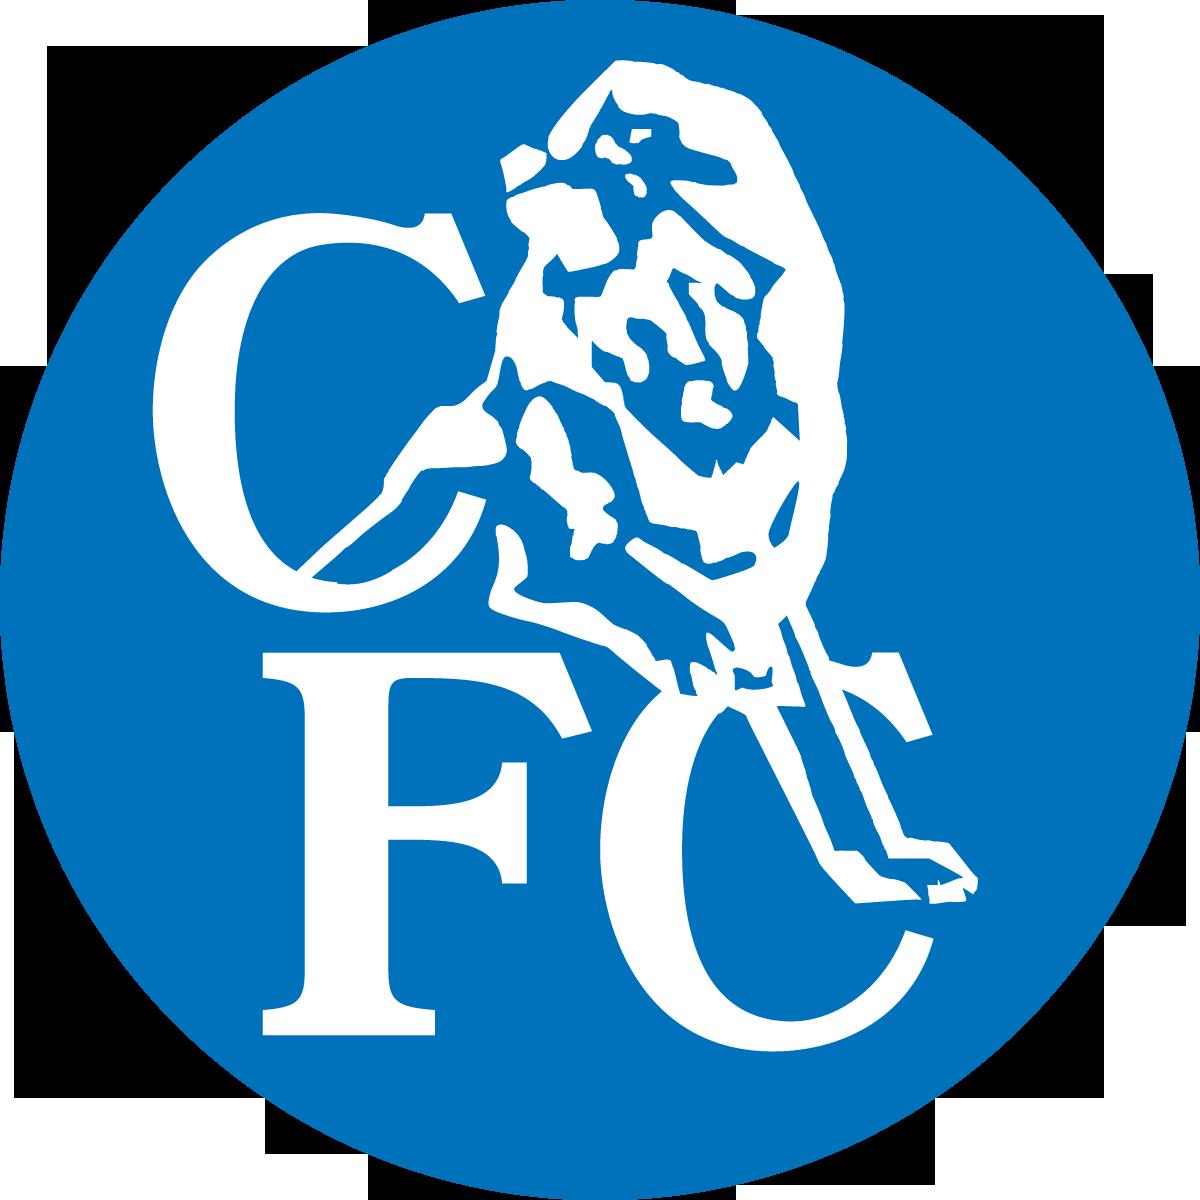 image chelsea fc logo white lion blue disc png logopedia rh logos wikia com chelsea fc logo hd 1920x1080 chelsea fc logo image download